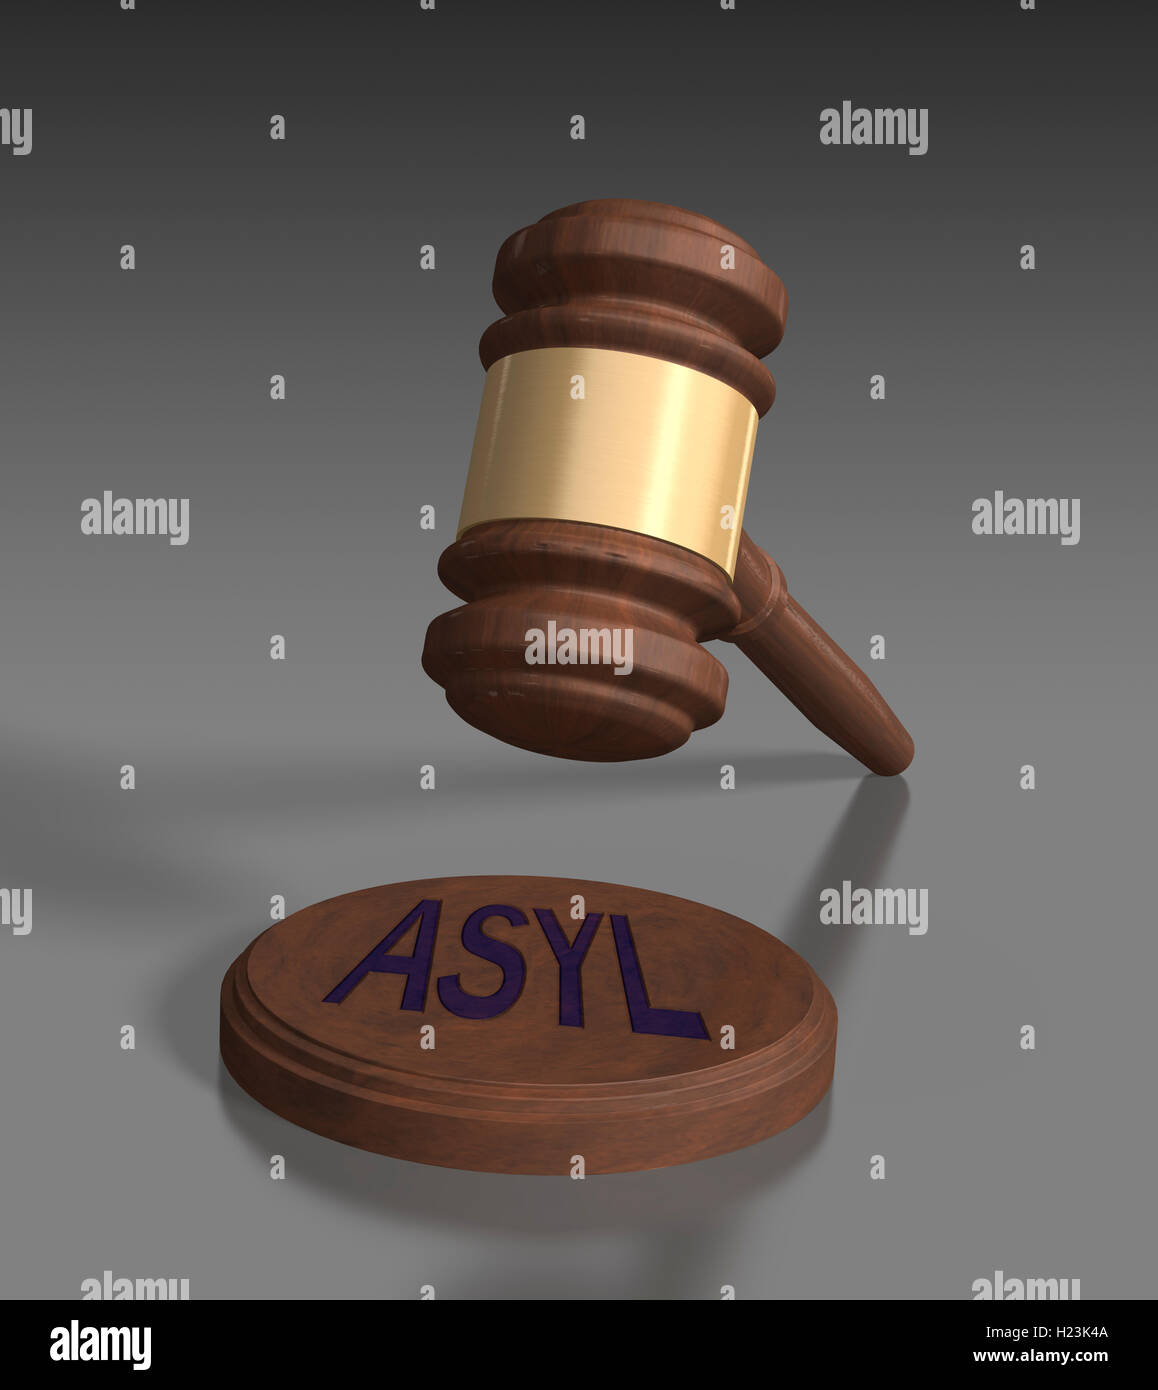 Gavel in front of grey background, Asyl, asylum written on block - Stock Image